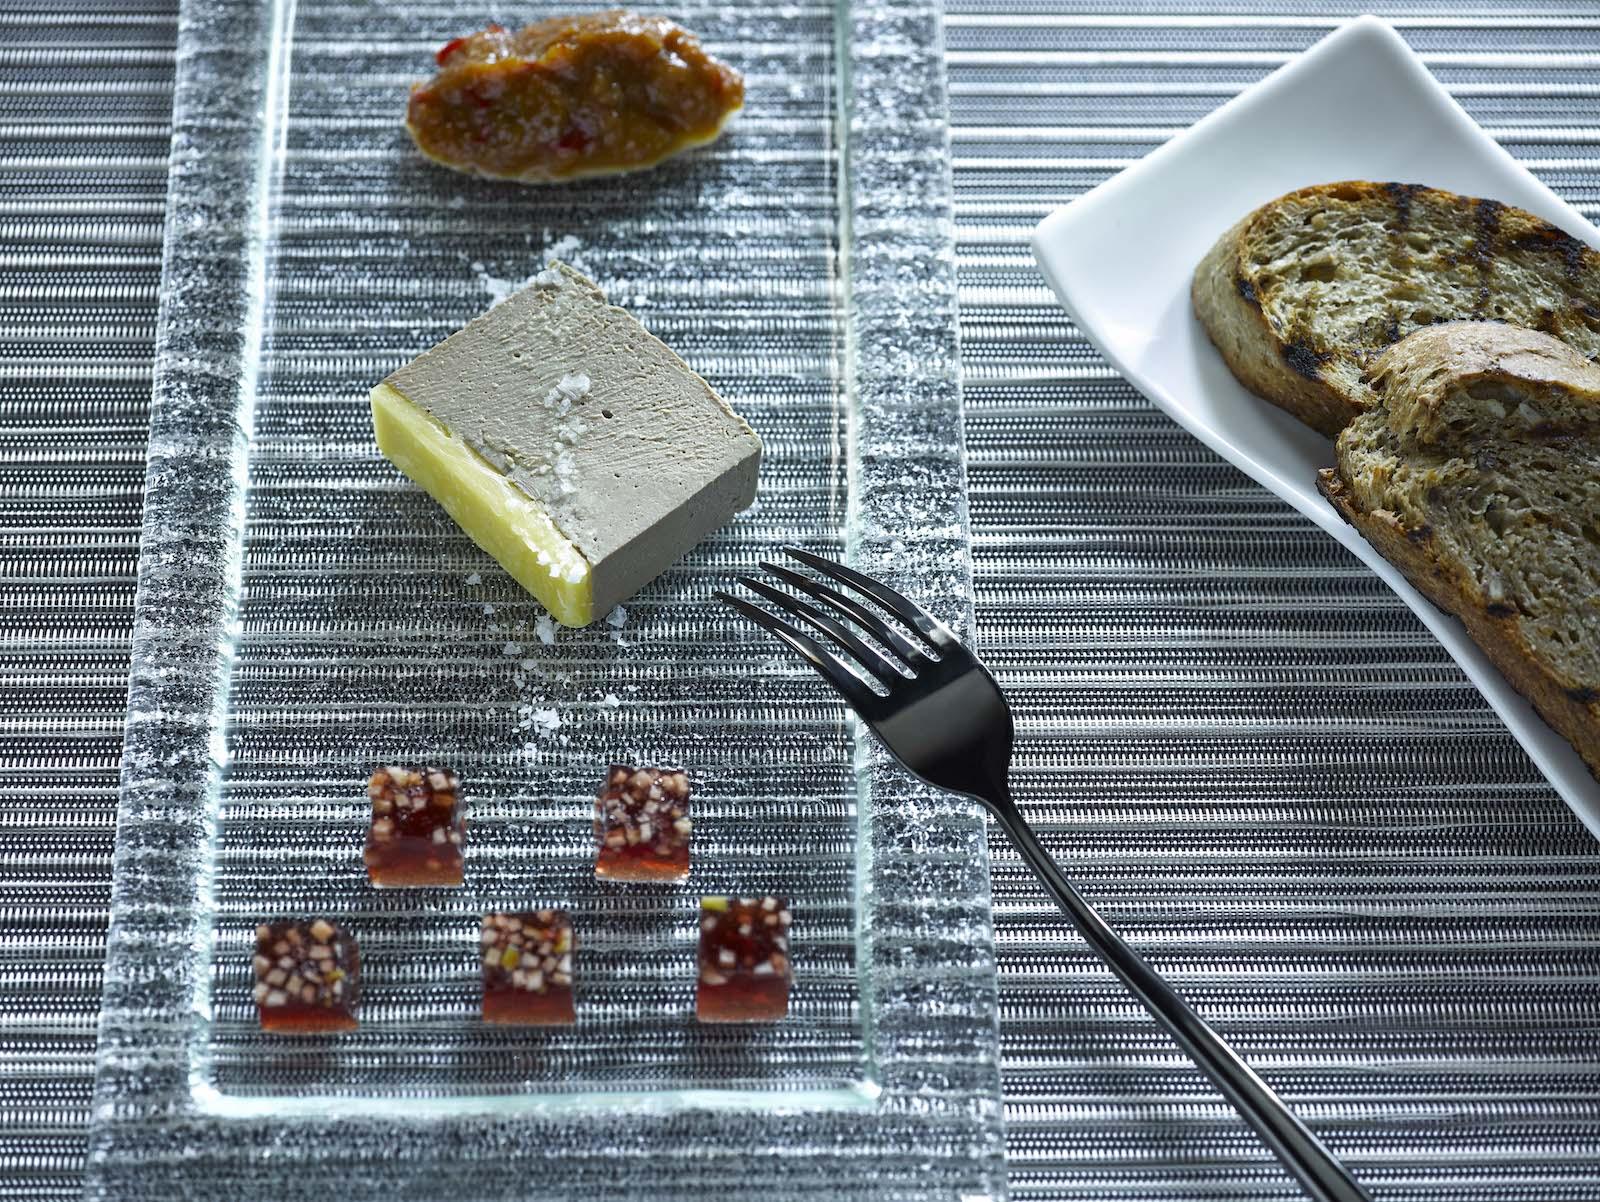 dusit-thani-abu-dhabi_dining_capital-grill_food_foie-gras